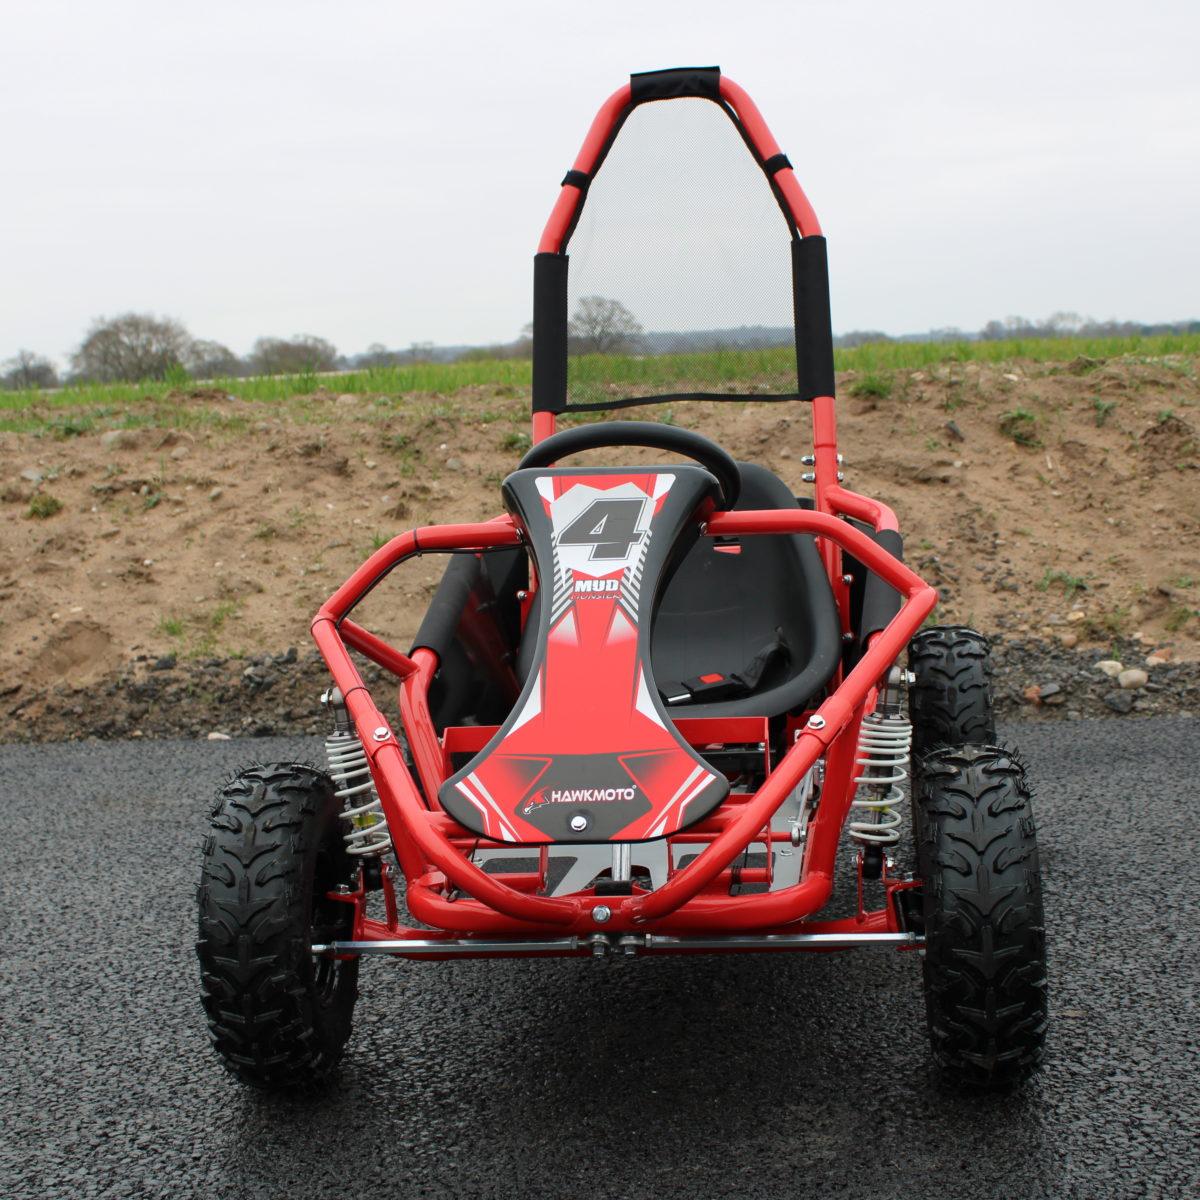 Hawkmoto Kids Buggy 98cc 4-stroke Petrol Utv Go Kart – Red